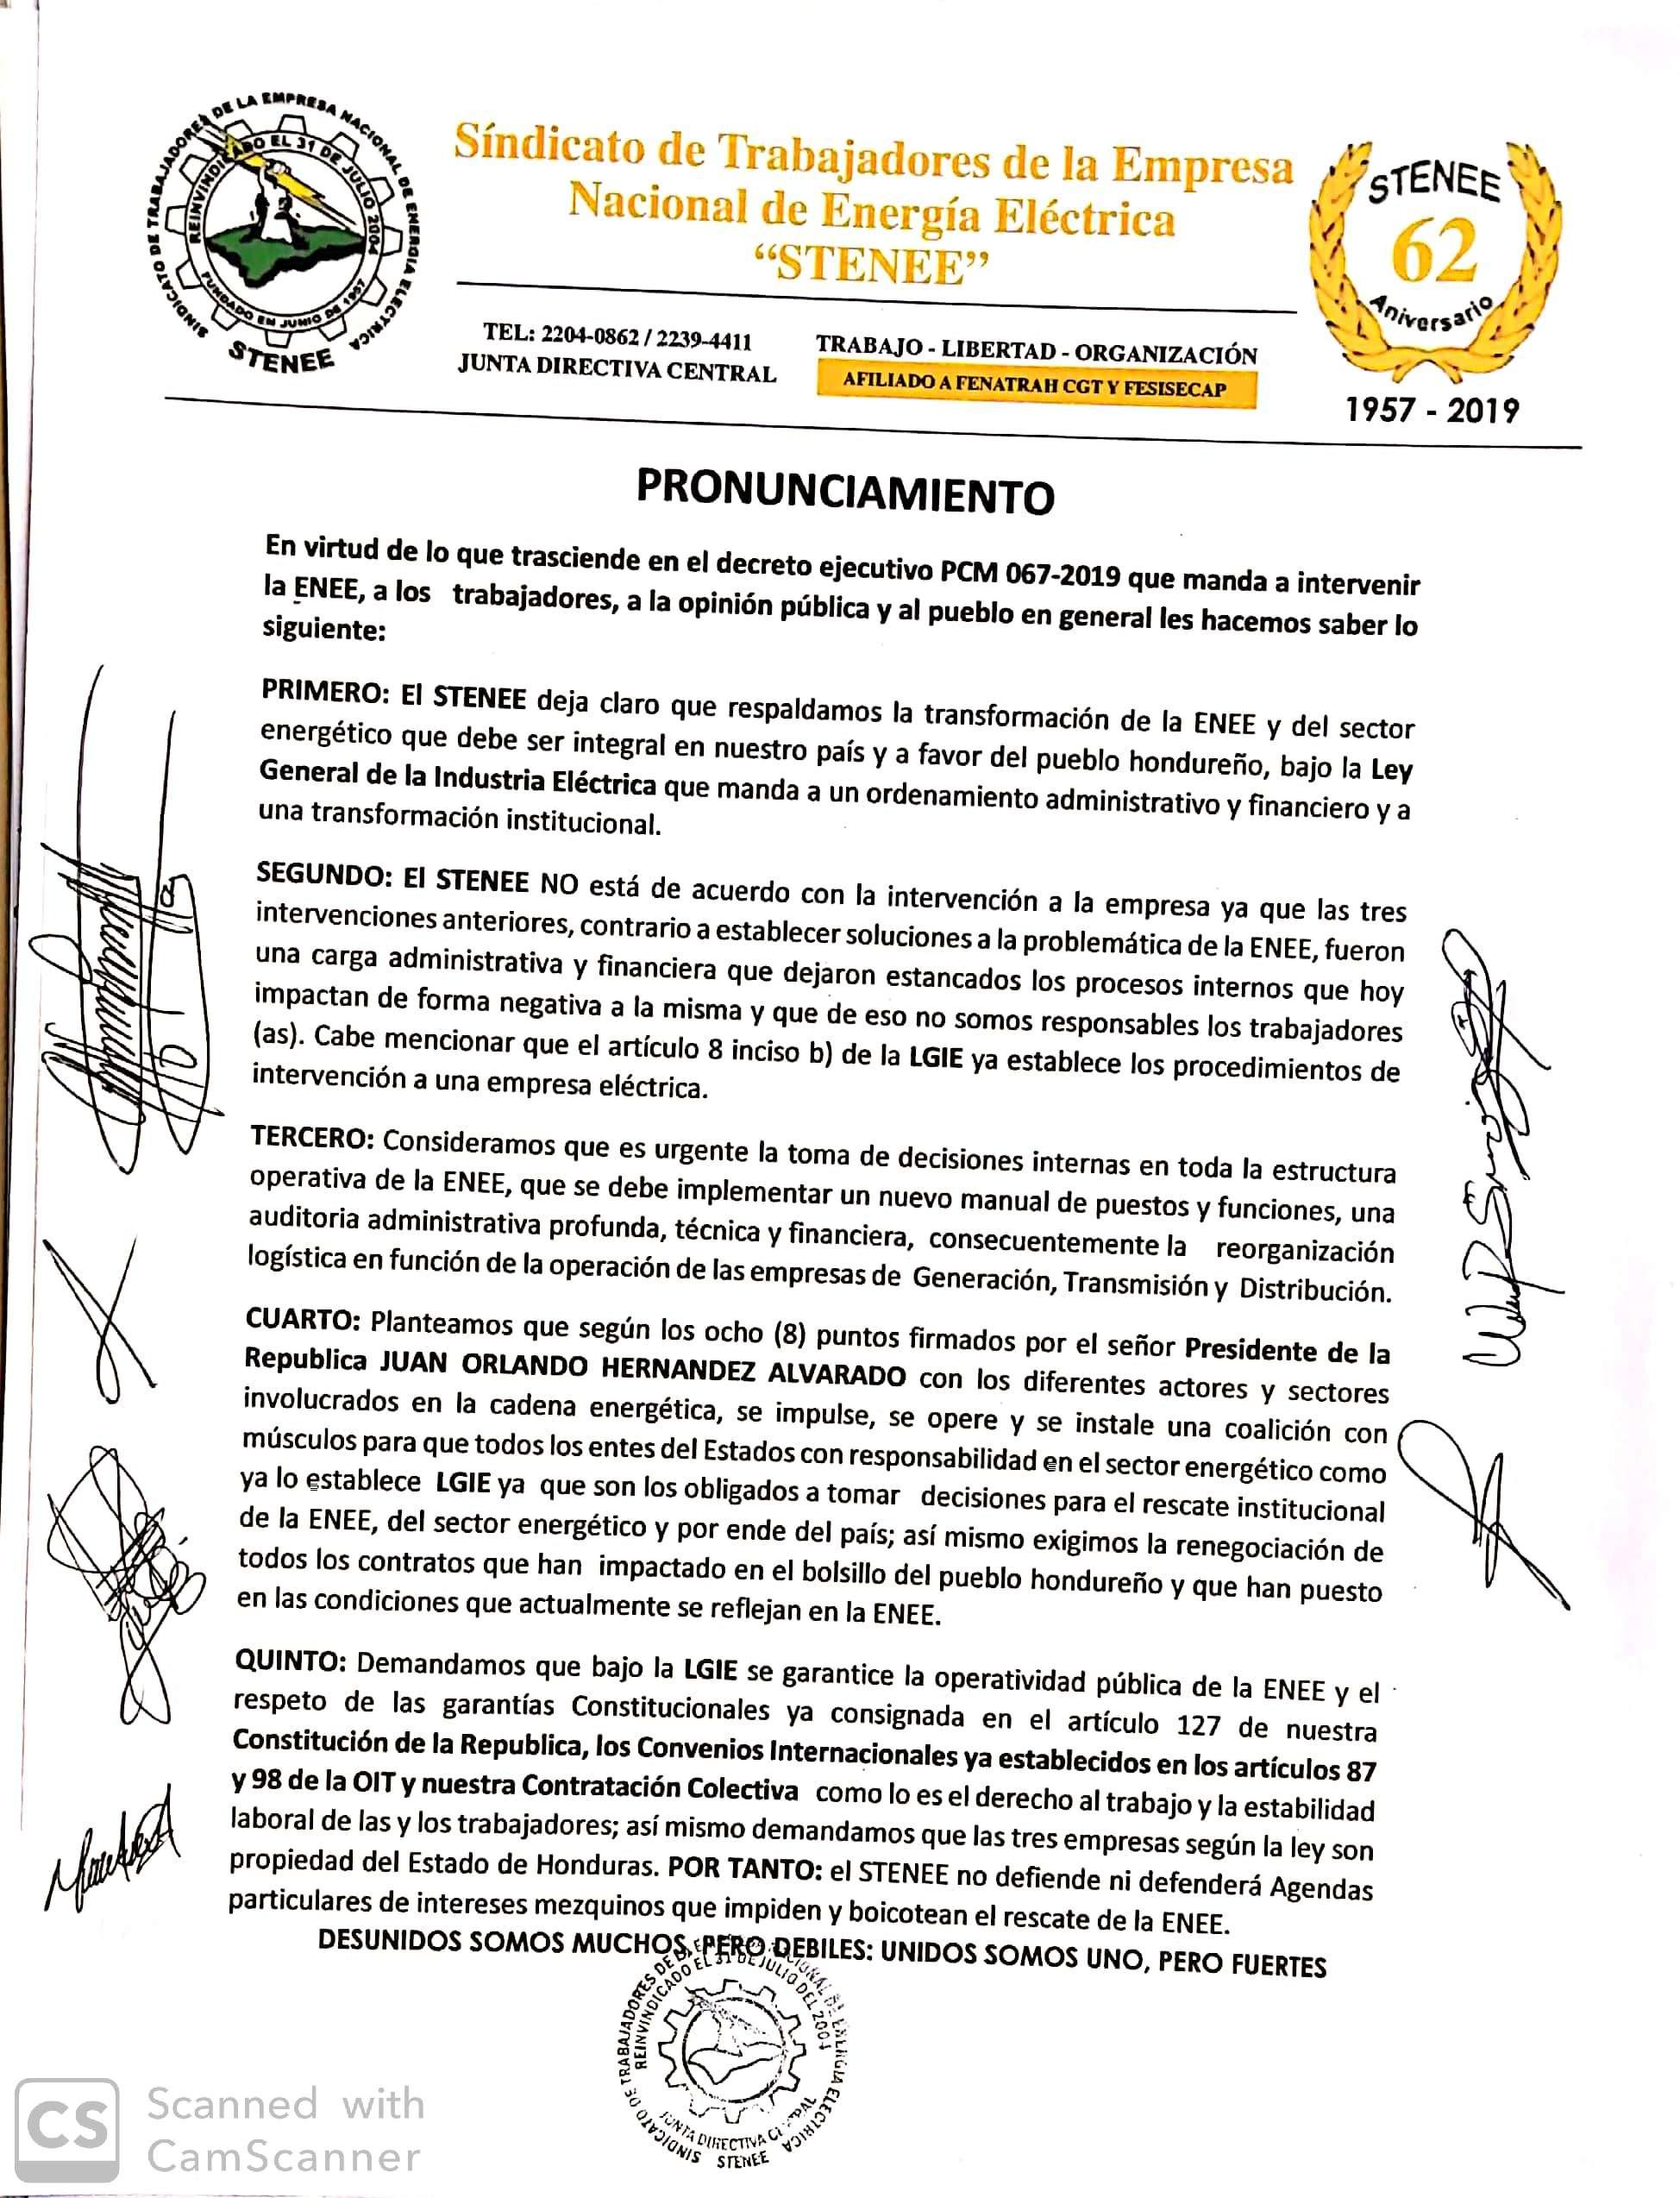 https://0201.nccdn.net/1_2/000/000/111/fa3/NuevoDocumento-2019-12-23-06.55.38_1-1948x2548.jpg